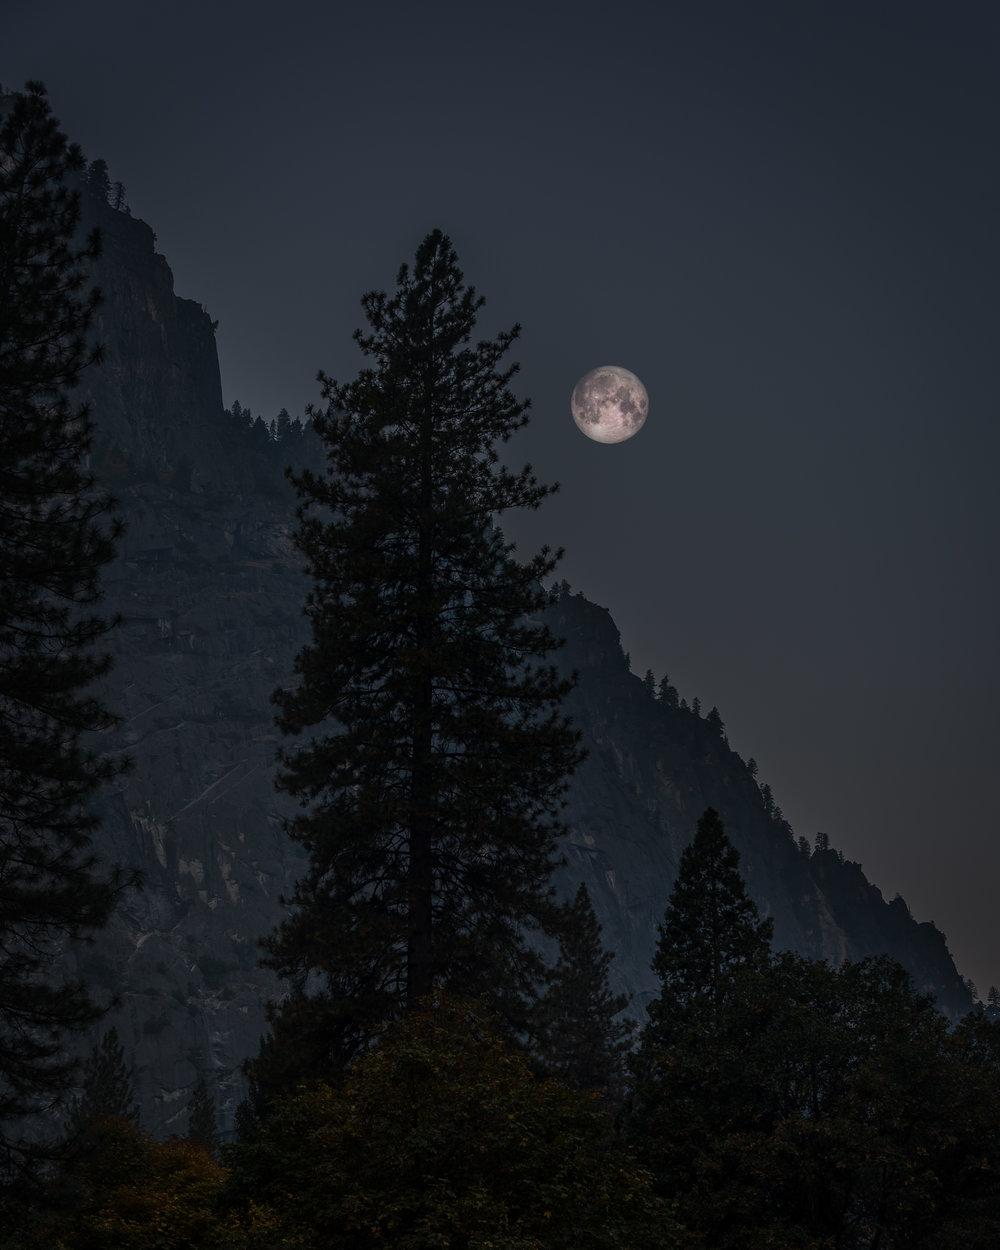 NAPA-Yosemite-26.jpg